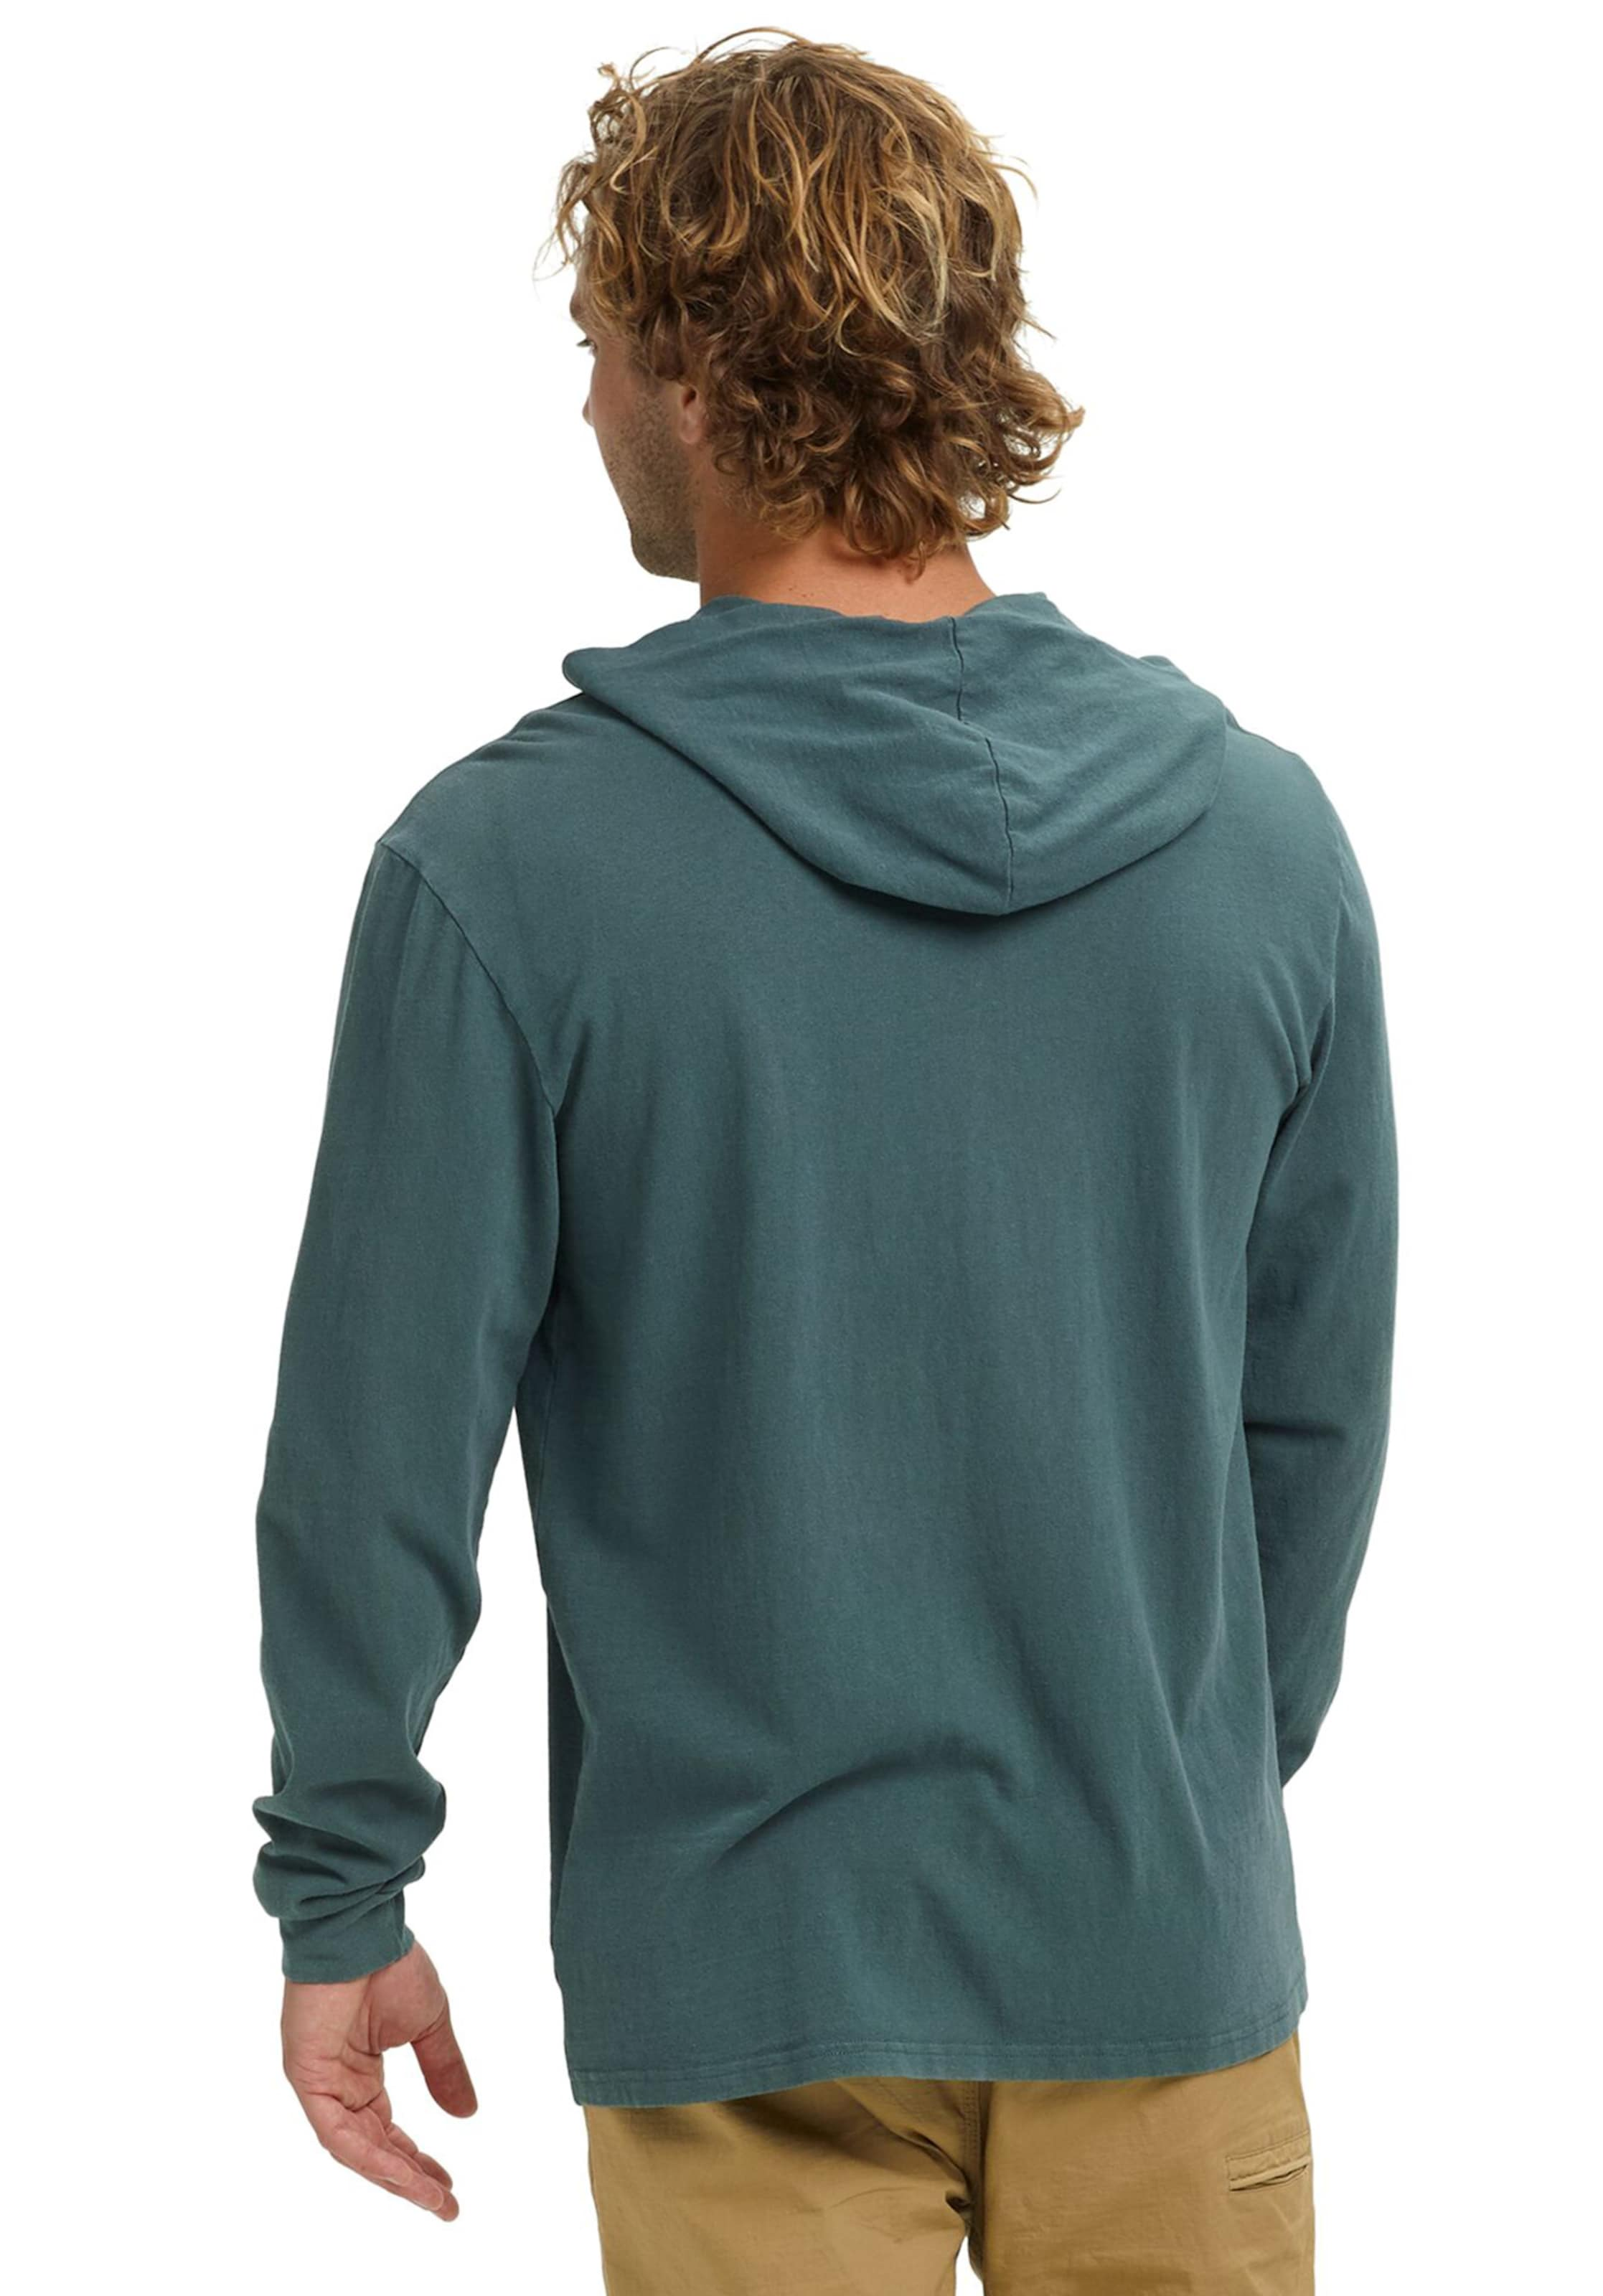 'putnam' 'putnam' In Smaragd Smaragd Burton Burton In Pullover Burton Pullover FJT5lKcu31